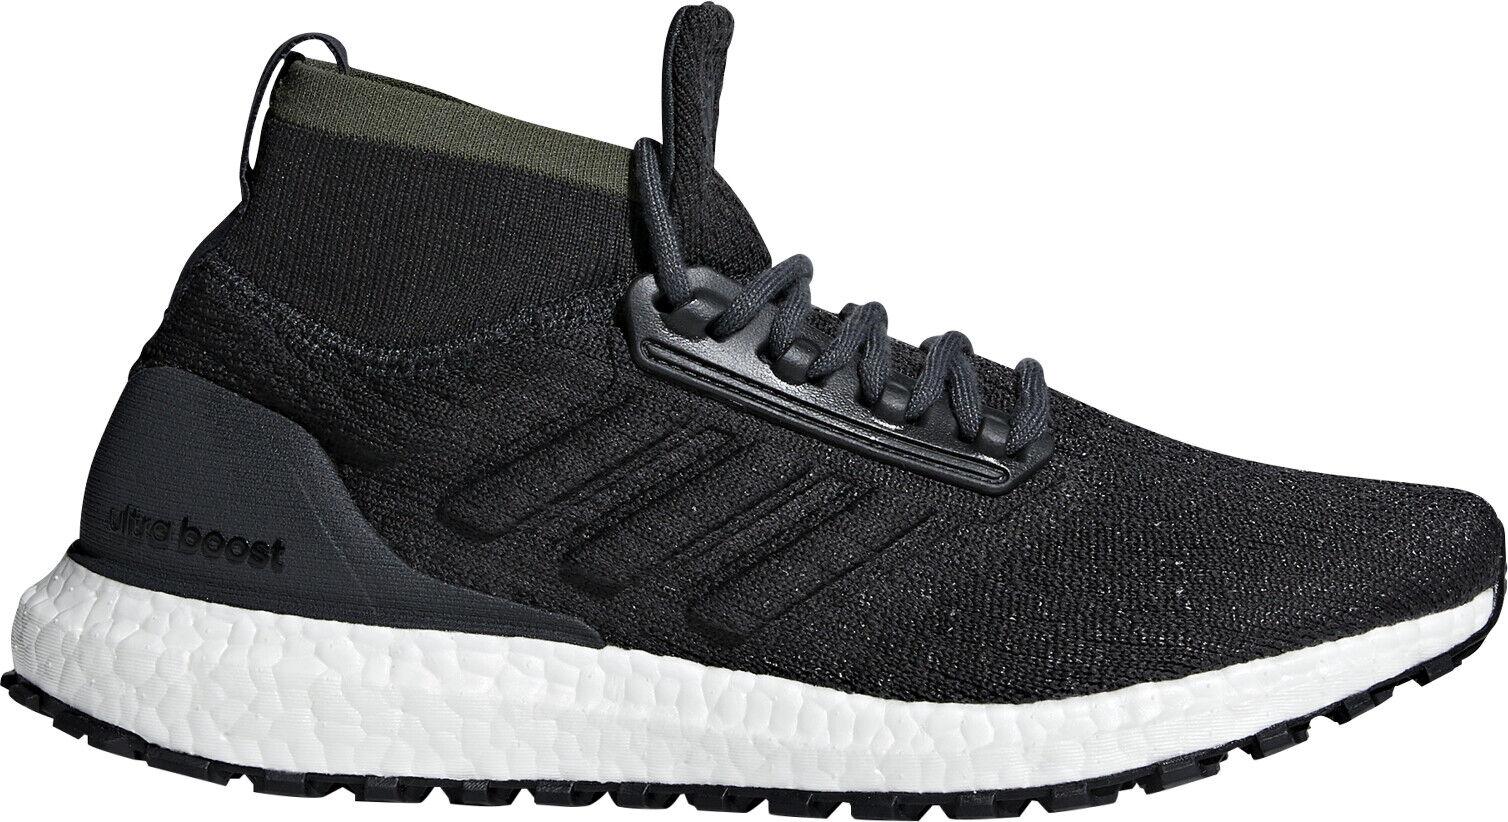 Adidas Ultra Boost All All All Terrain Mens Running shoes - Black 4e746e